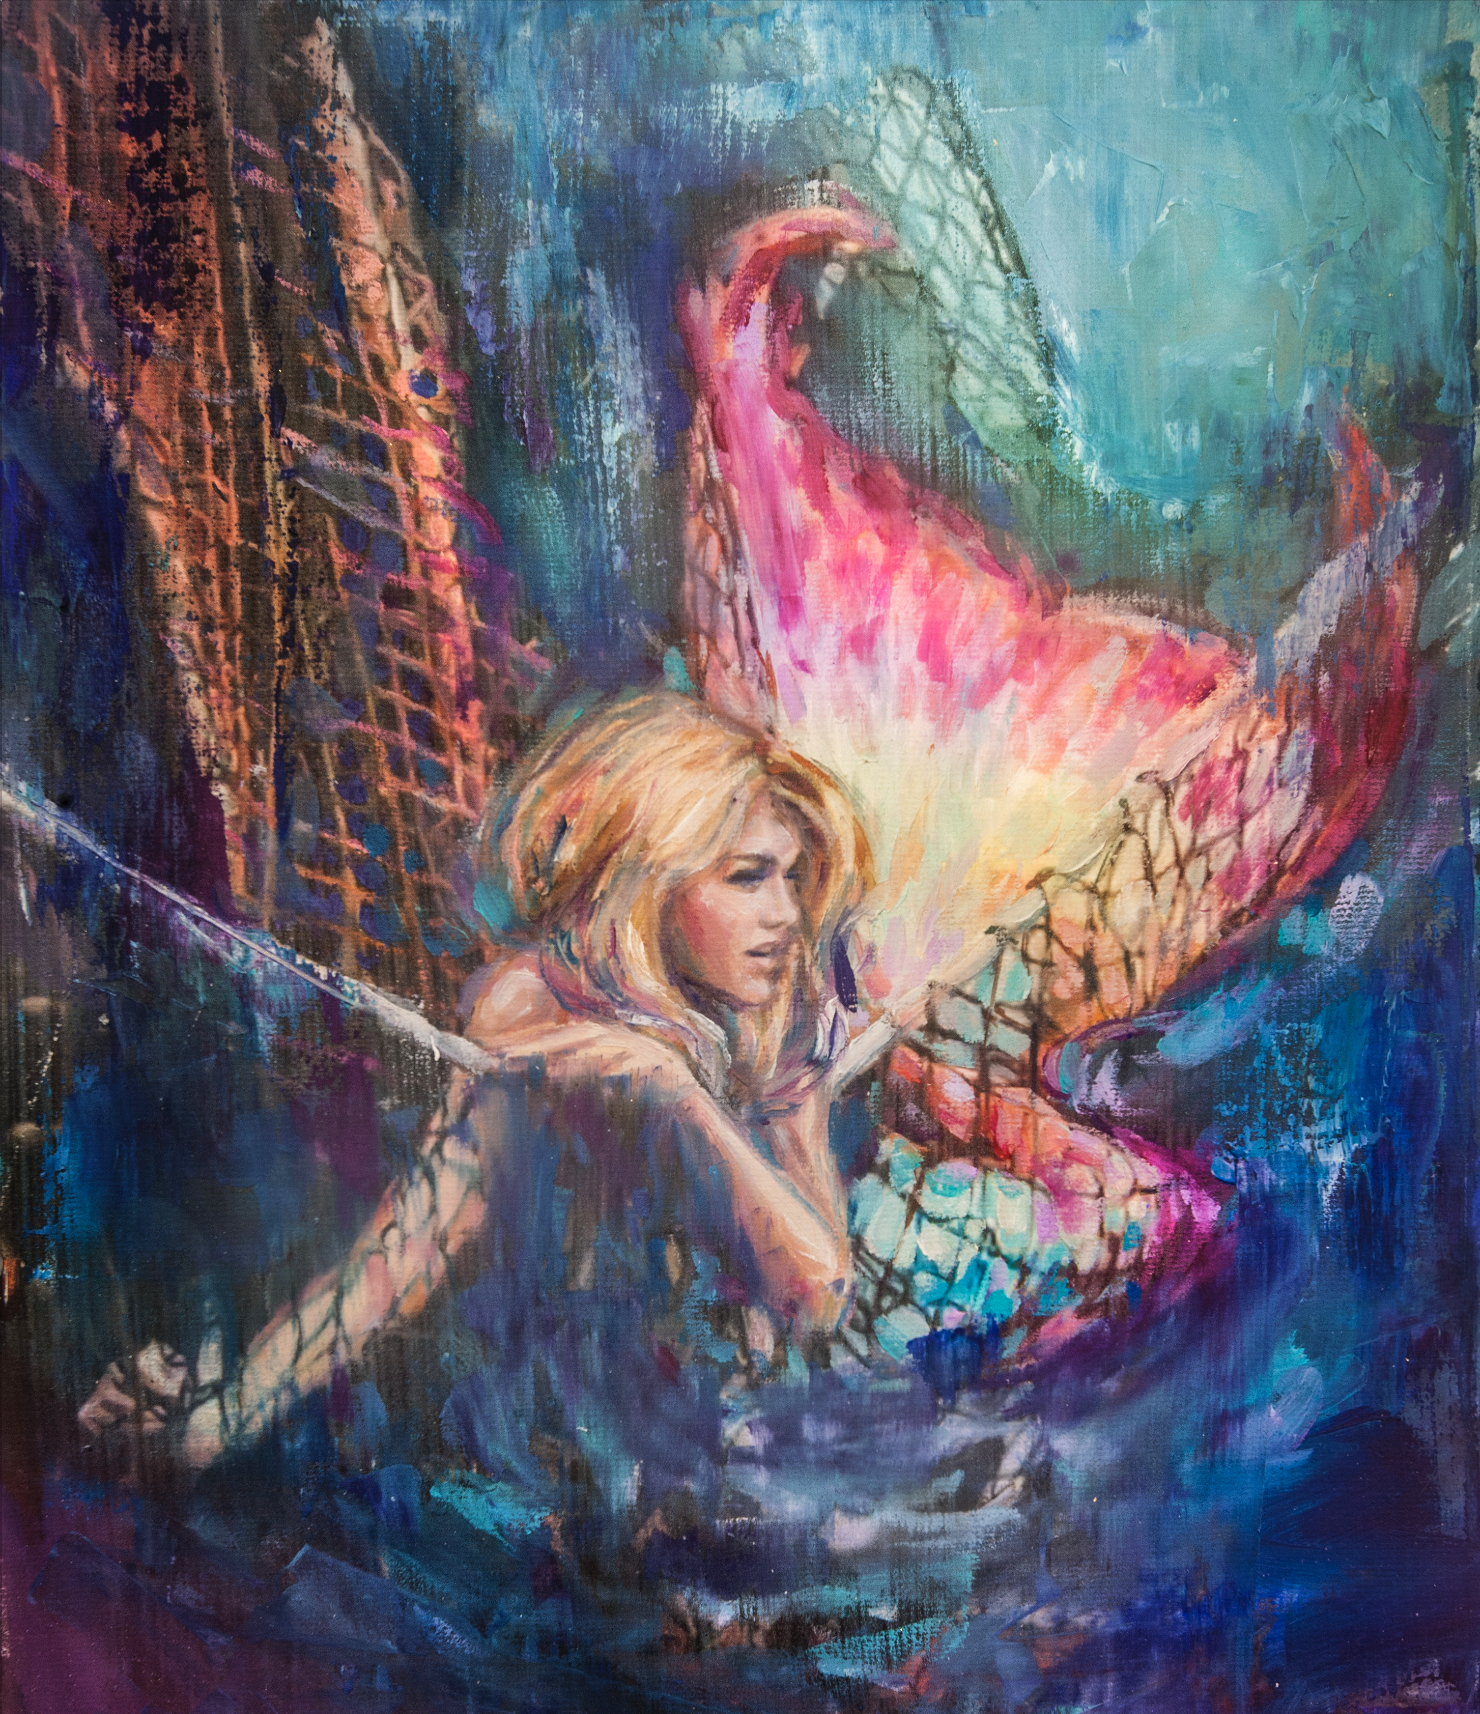 Code Aquamarine 10 Online Purchase #beautiful #mermaid #ocean #